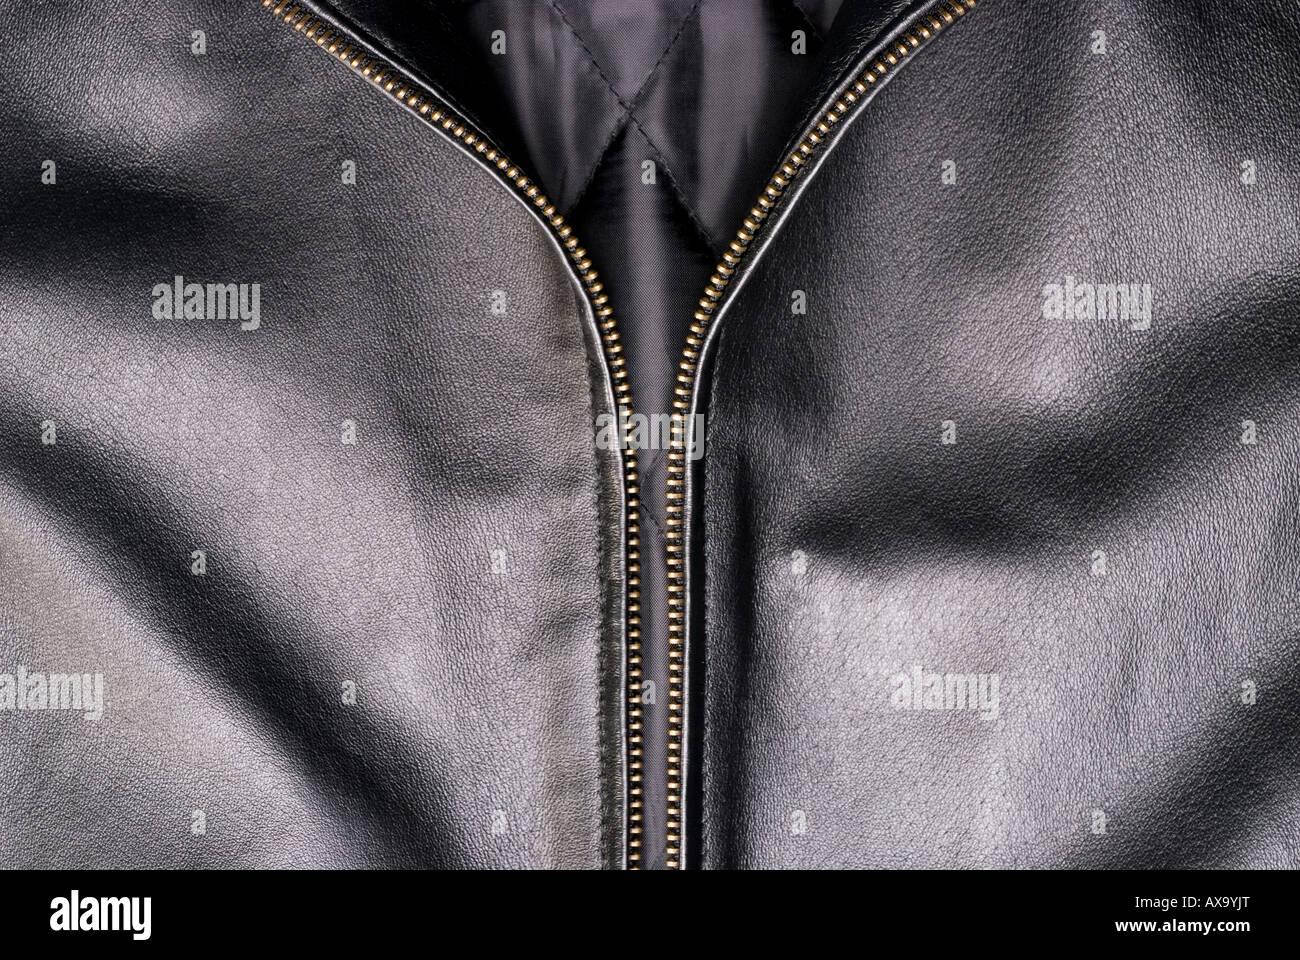 Gold Leather Jacket Stockfotos & Gold Leather Jacket Bilder - Alamy